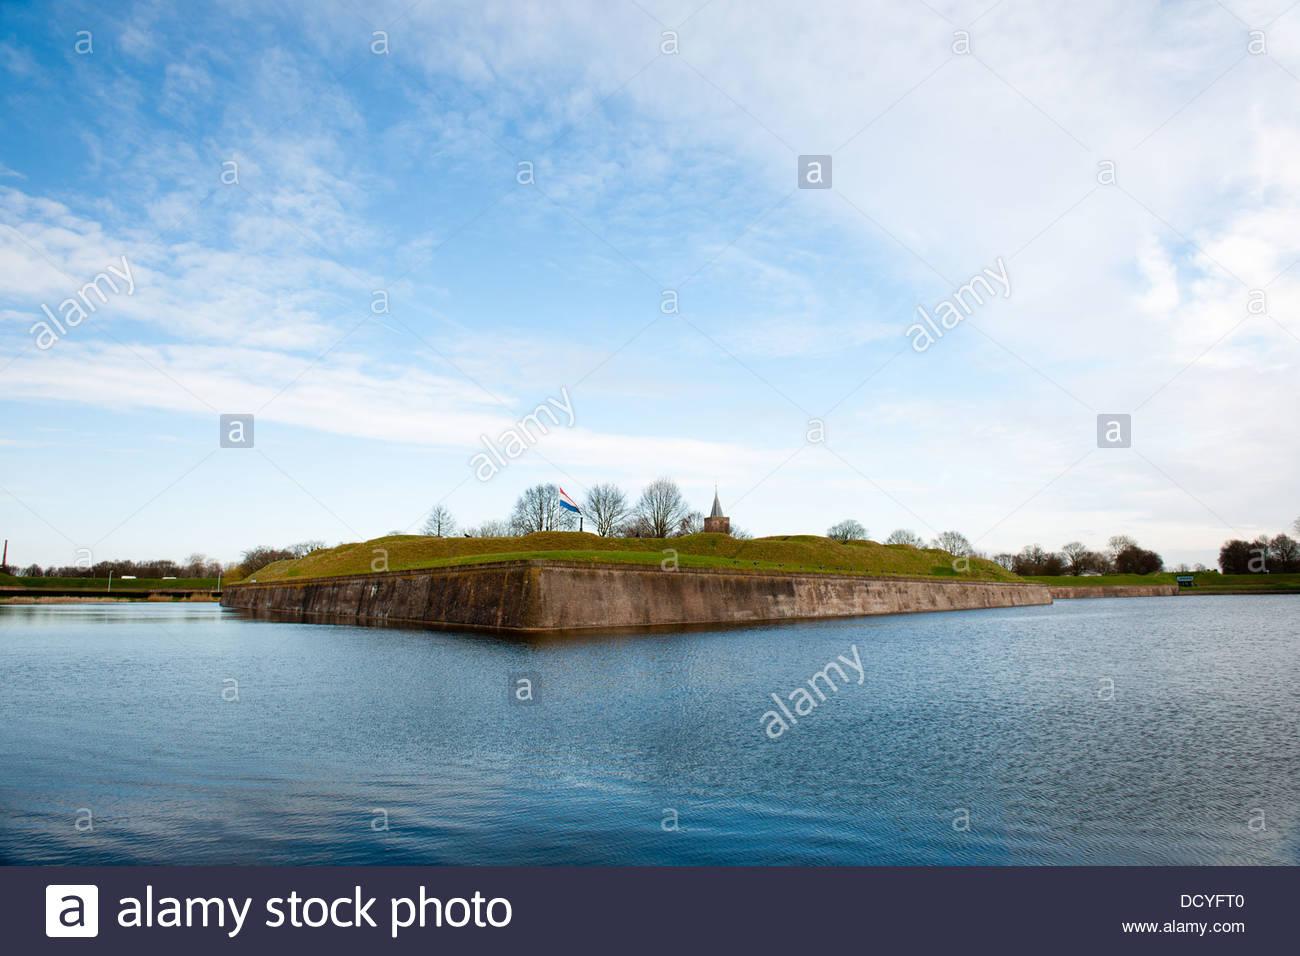 Dutch fortress in Naarden - Stock Image